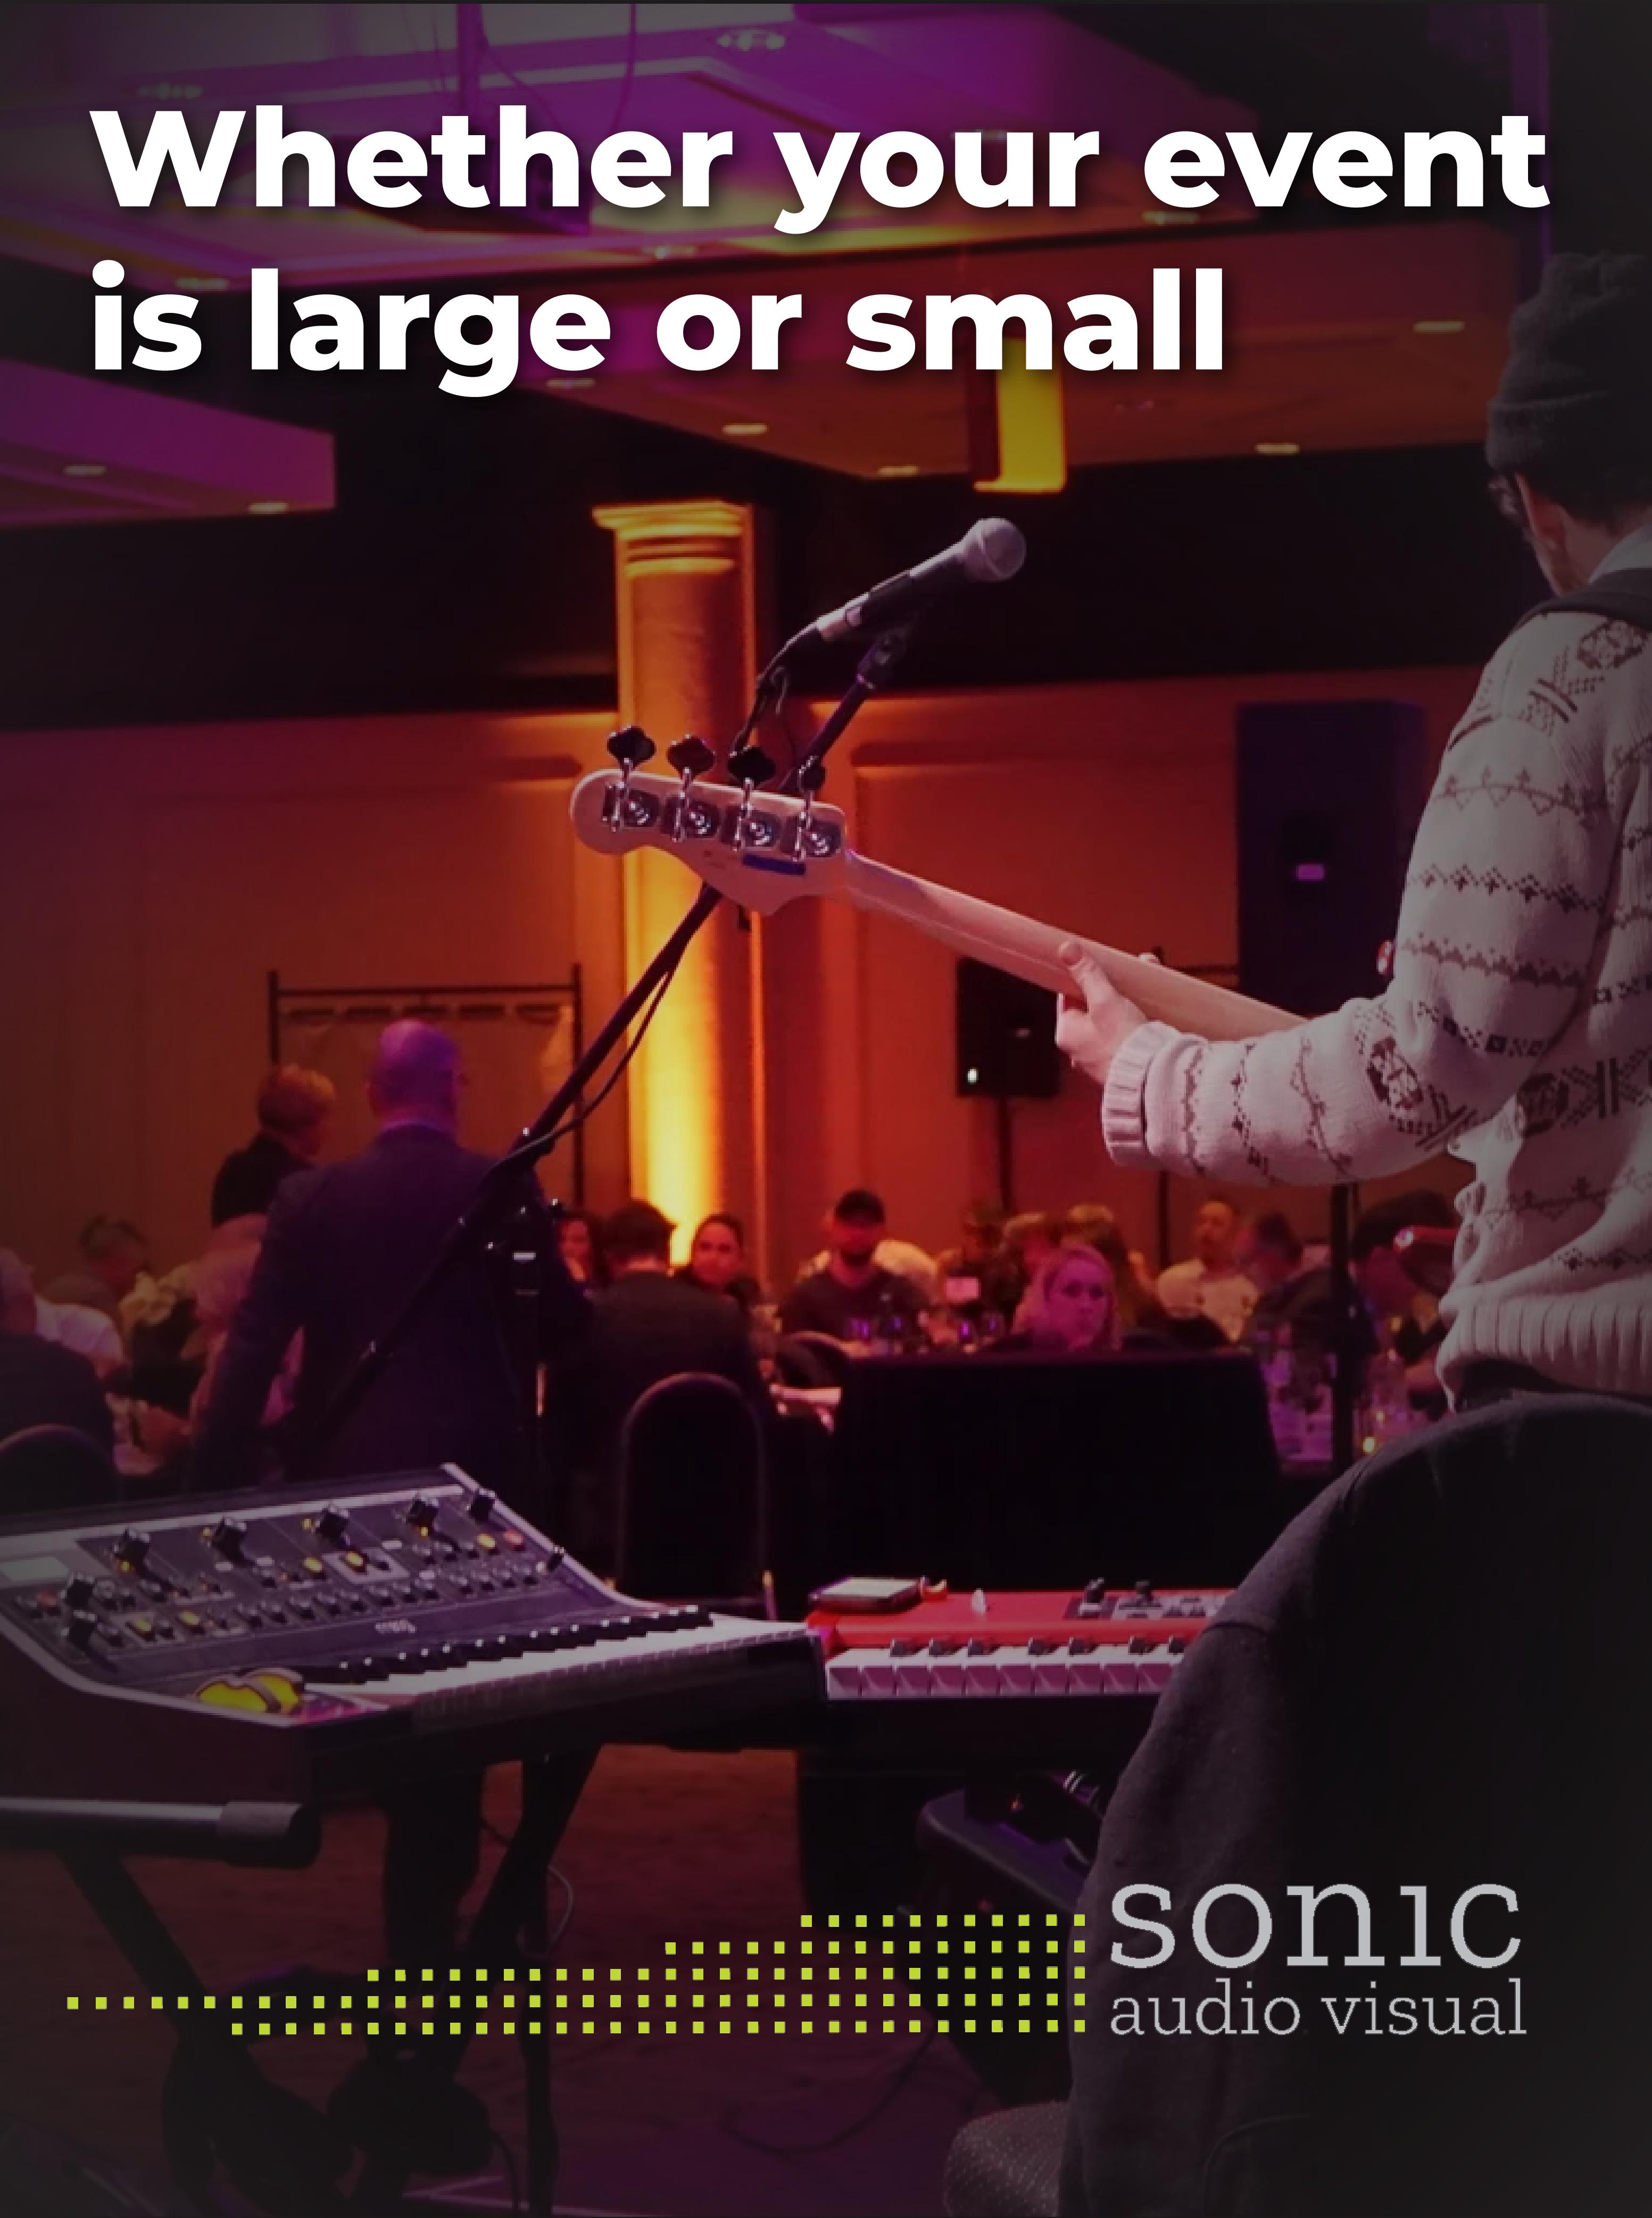 Sonic Audio Visual ad slide 2